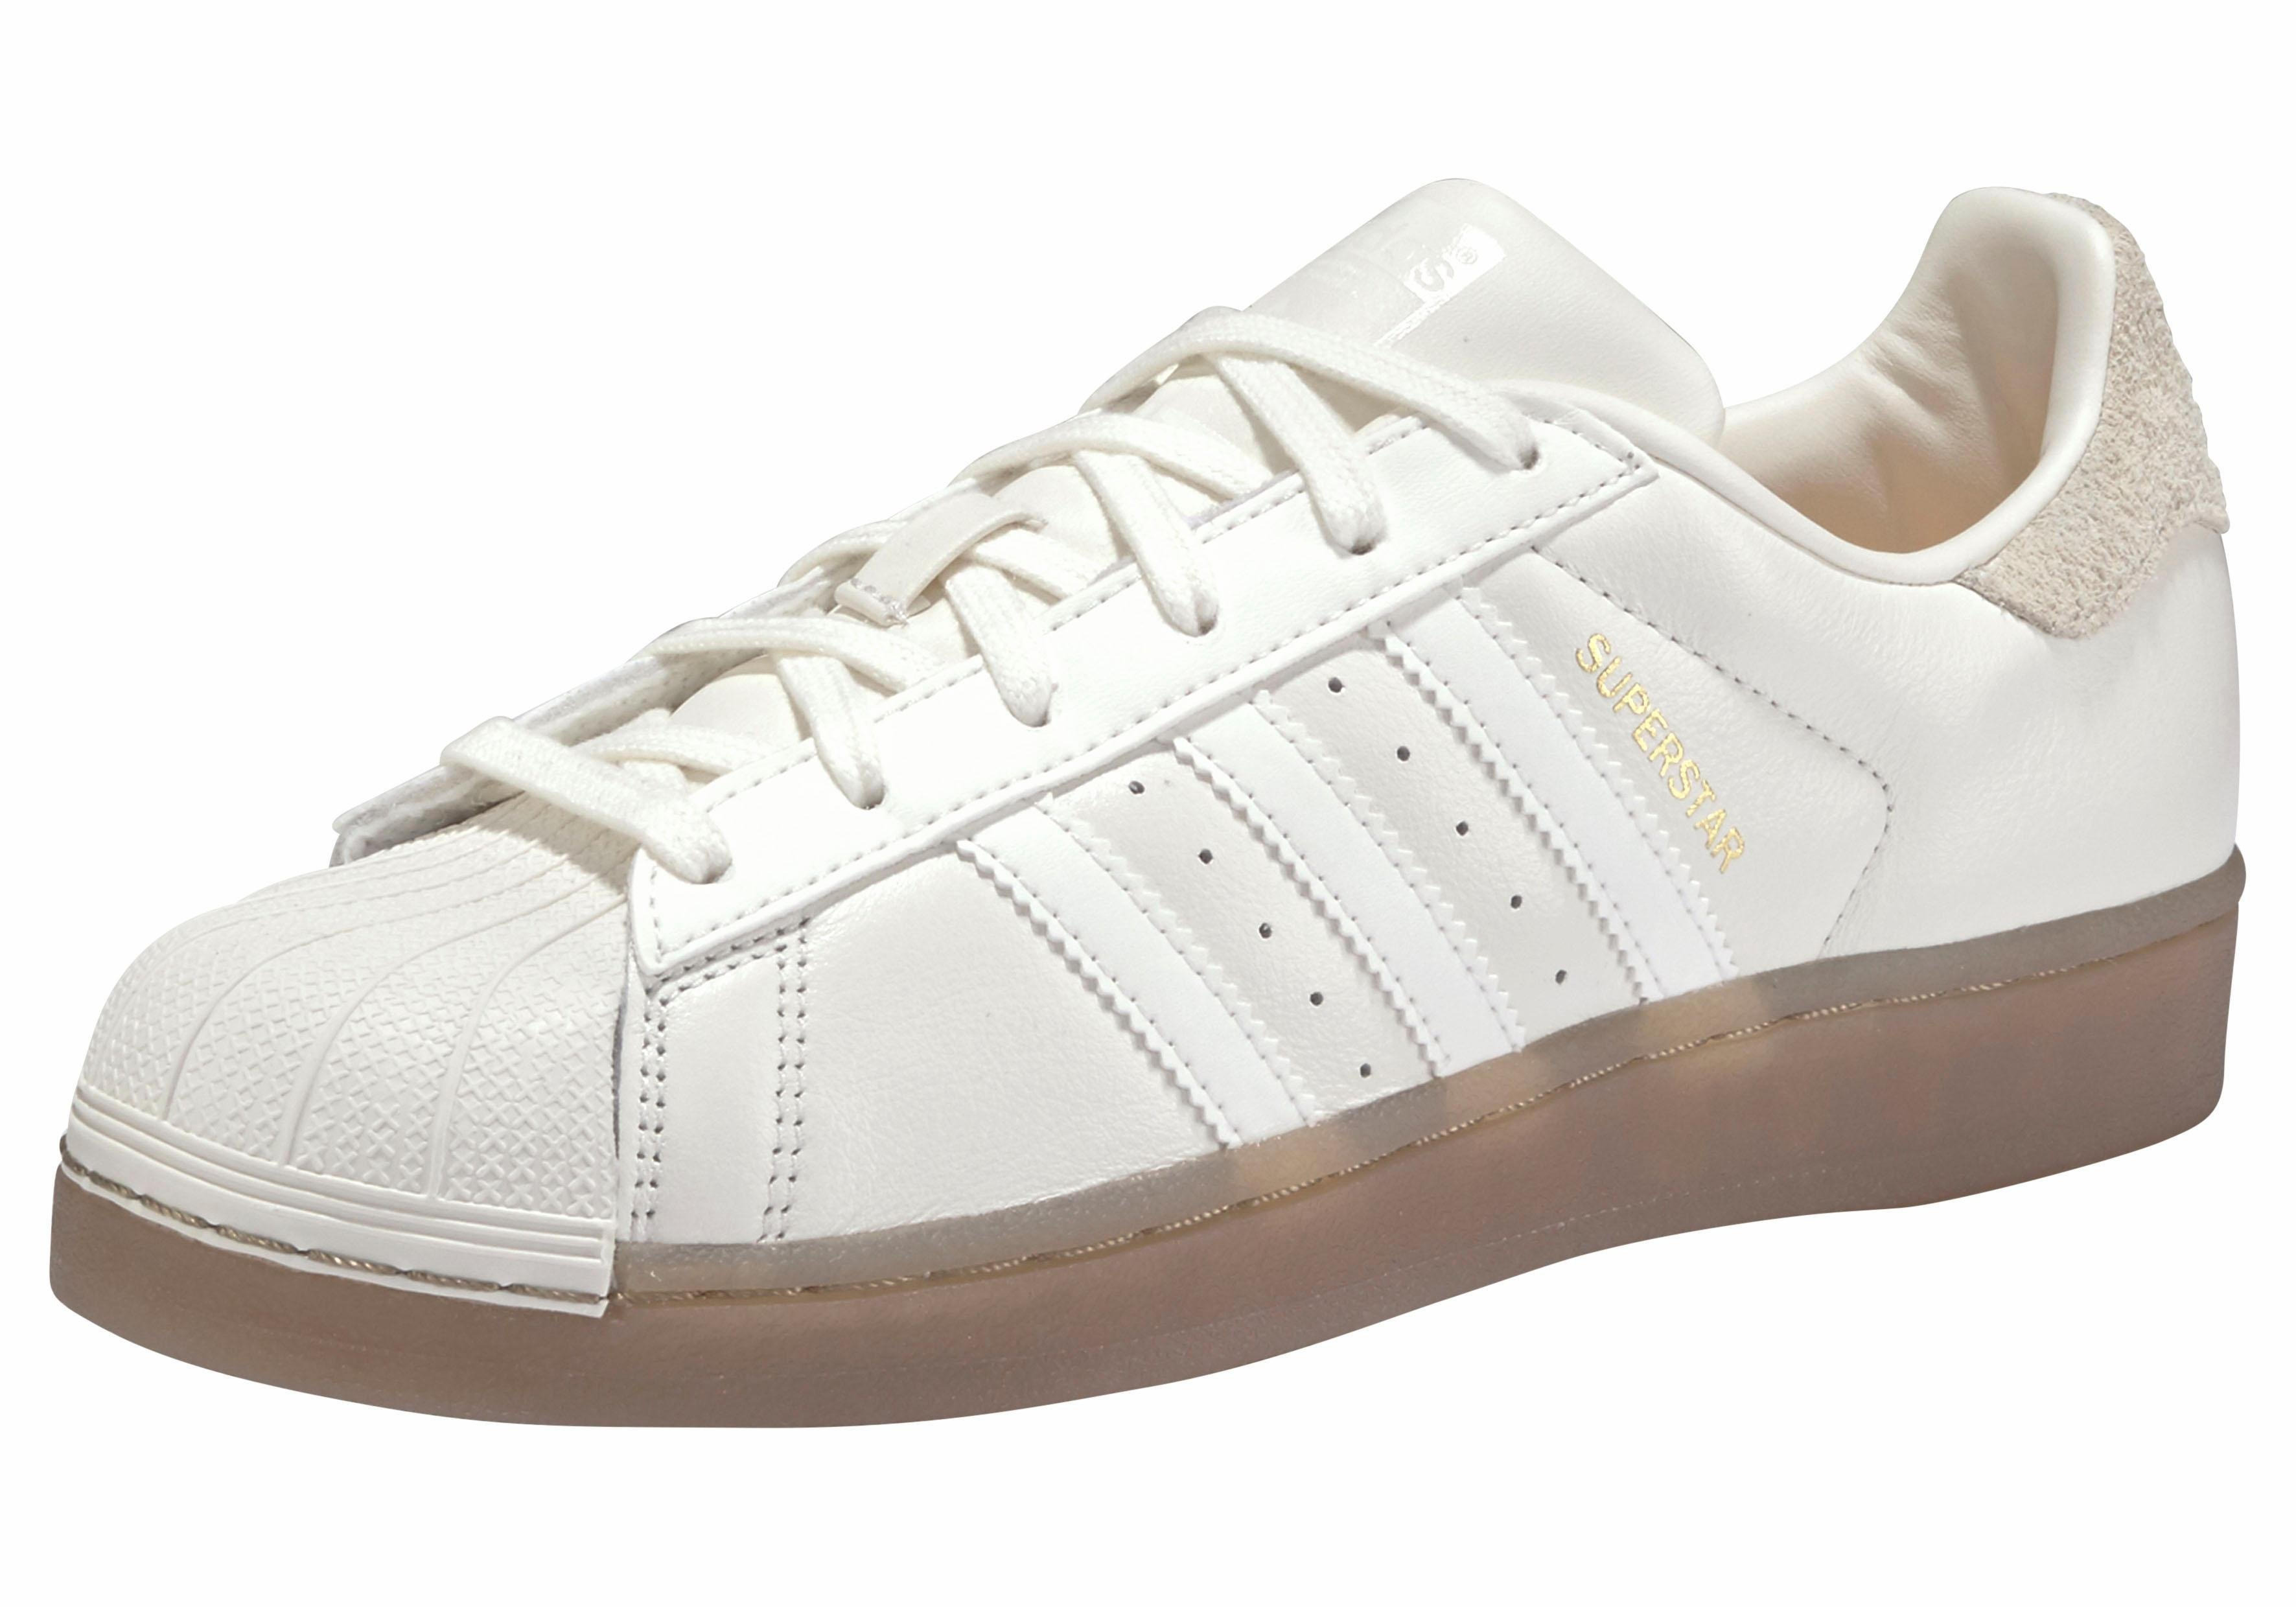 c42845daede ... adidas Originals sneakers »Superstar W Gum«, adidas Originals sneakers »Superstar  W 1«, adidas Originals sneakers »Superstar W 1«